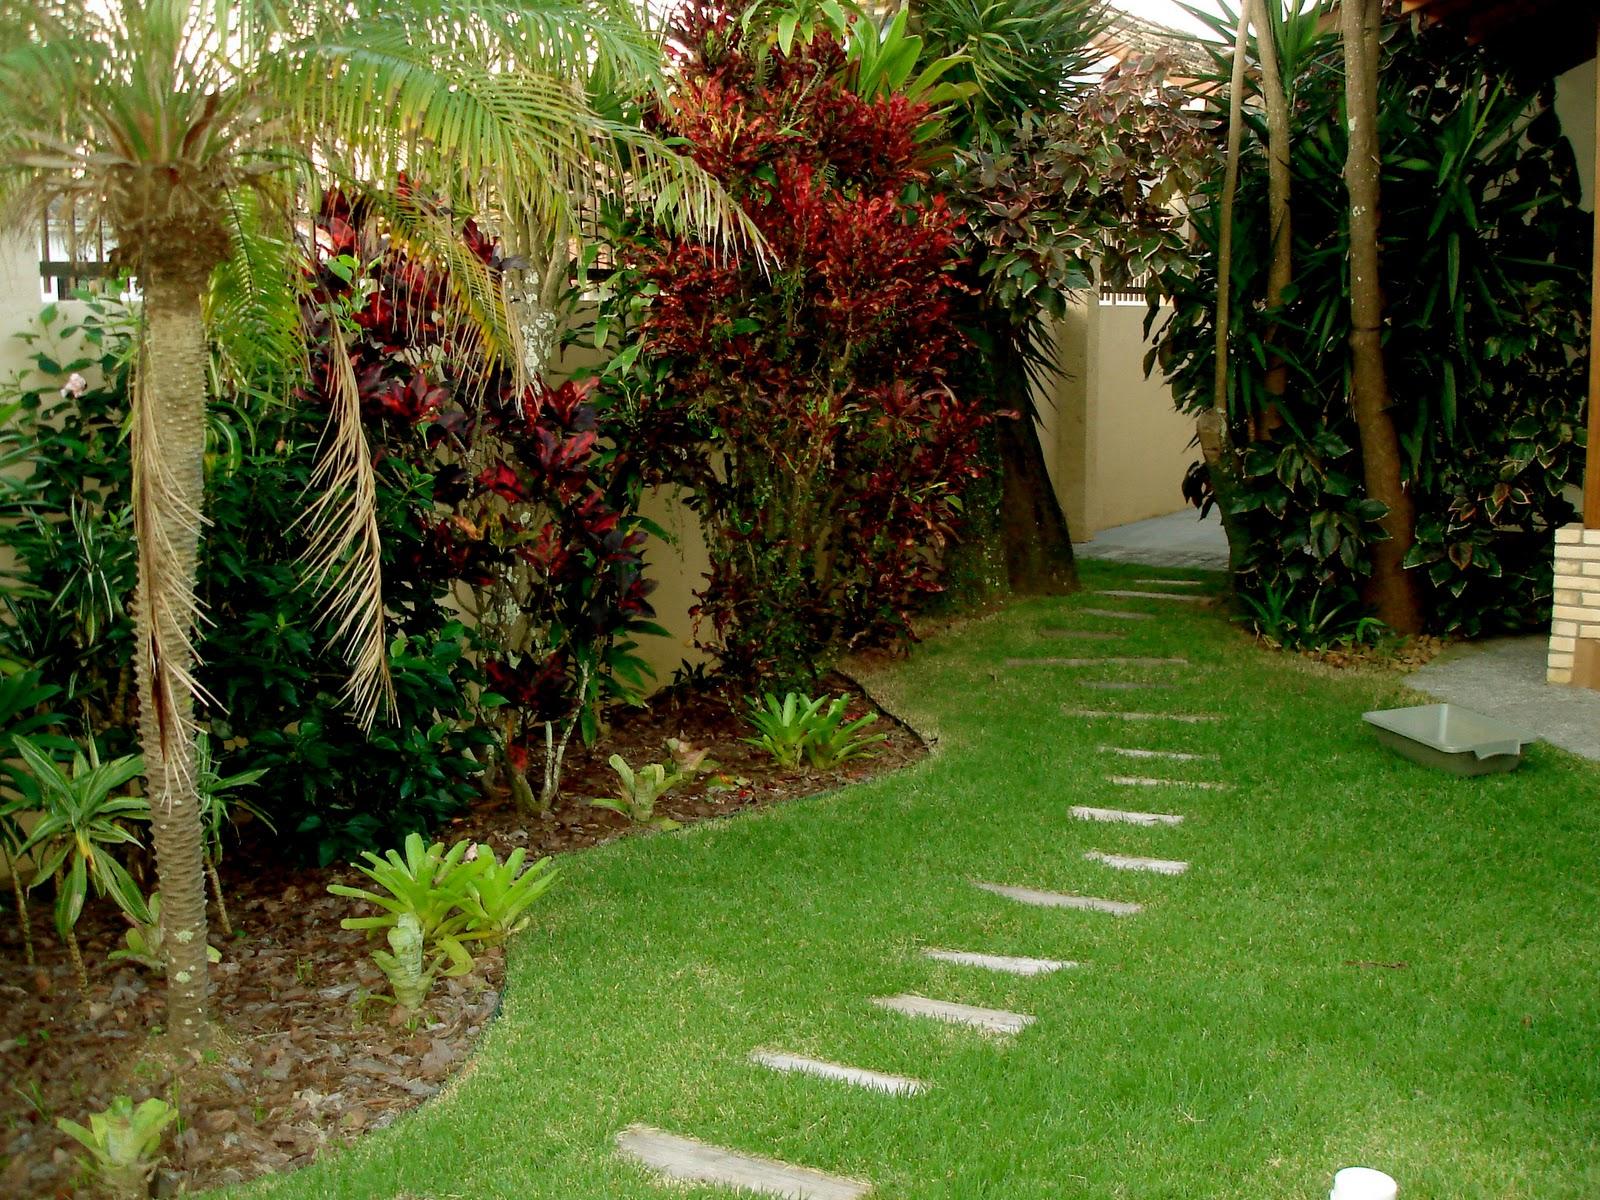 projeto de gruta de jardim : projeto de gruta de jardim:+Projetos+Manutenção de Jardins: Projeto e execução: jardim